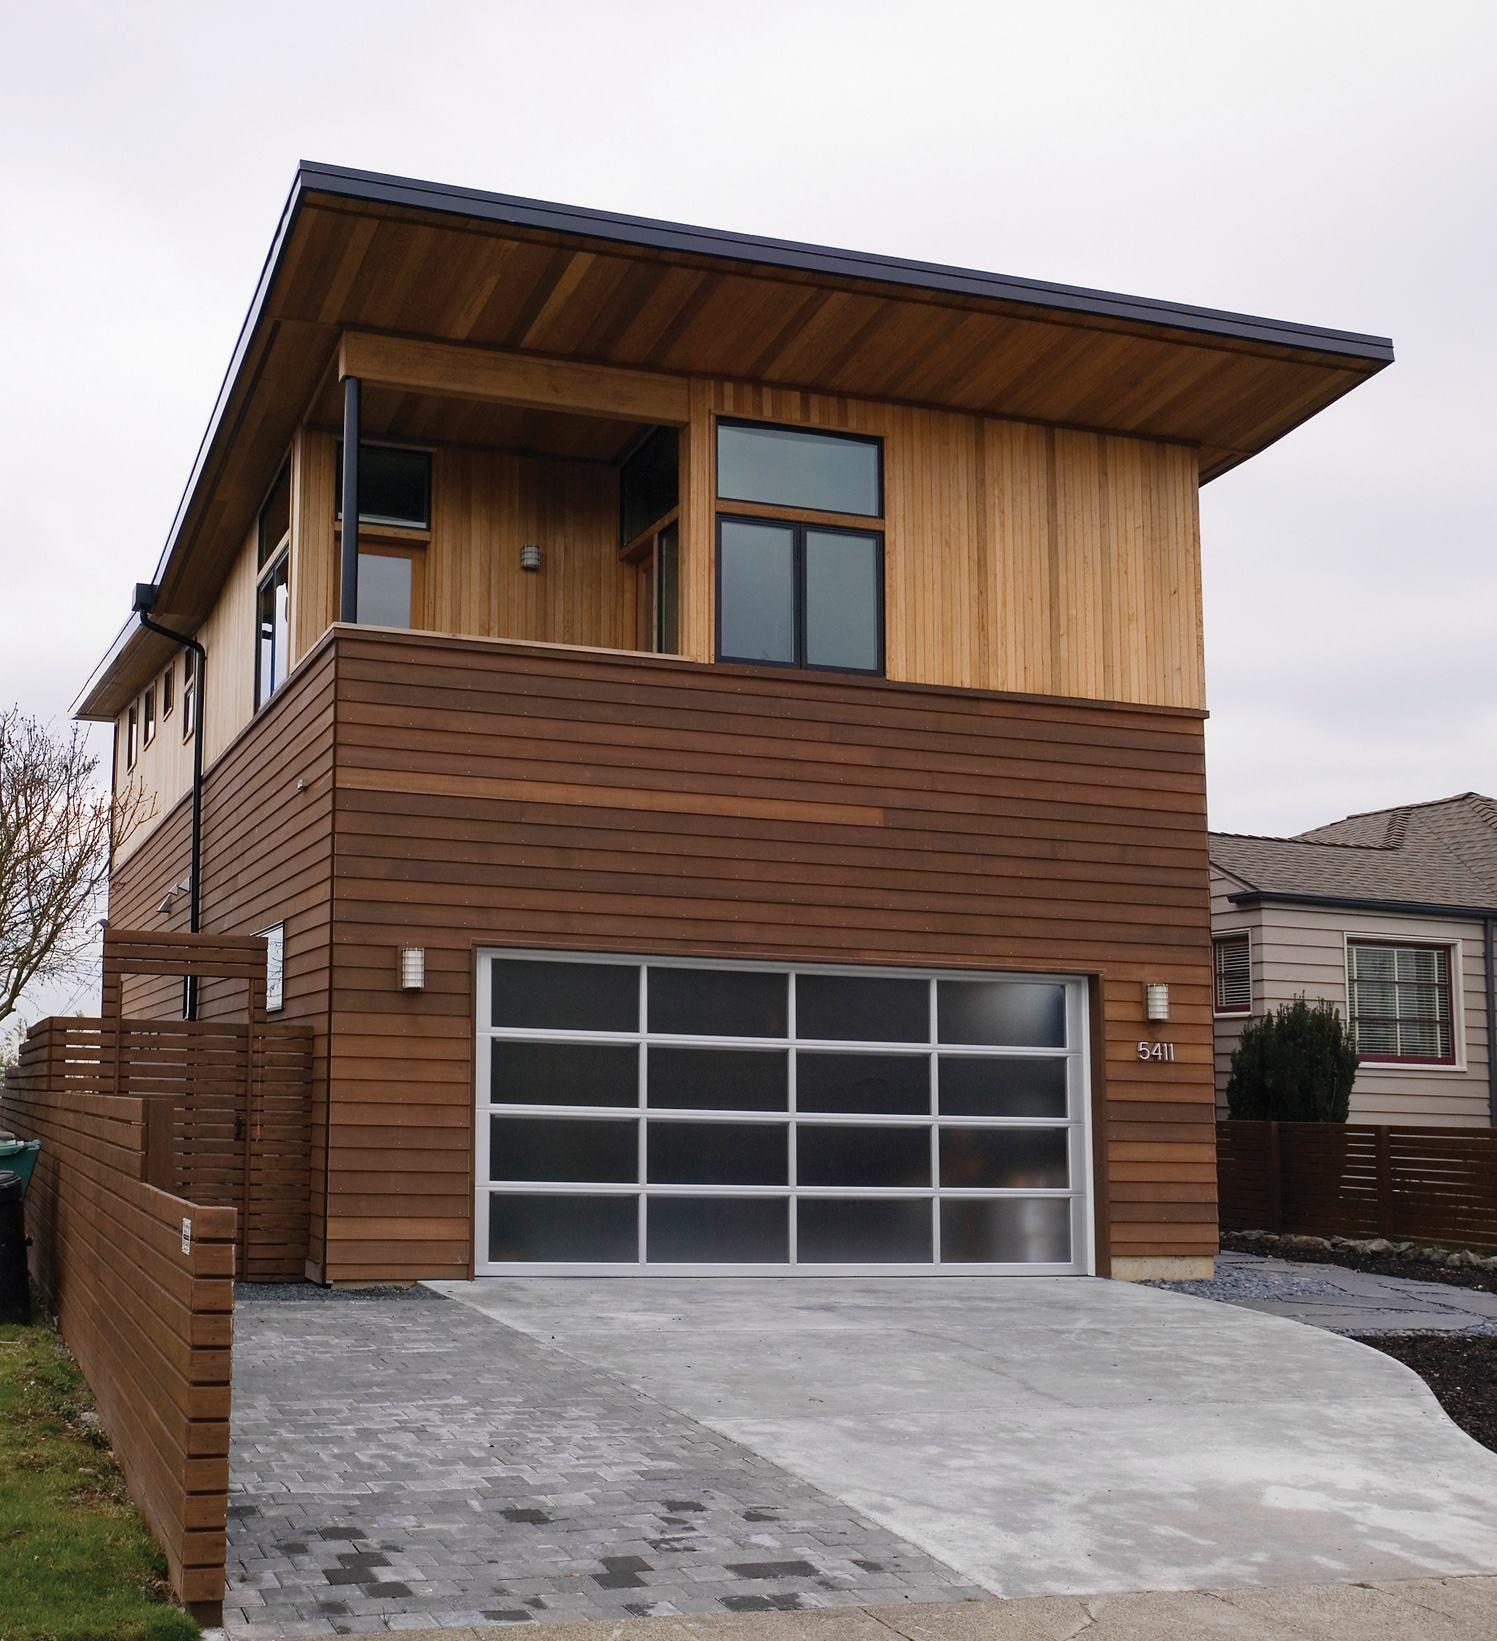 Blip Design Avante Garage Doors Clopay Building